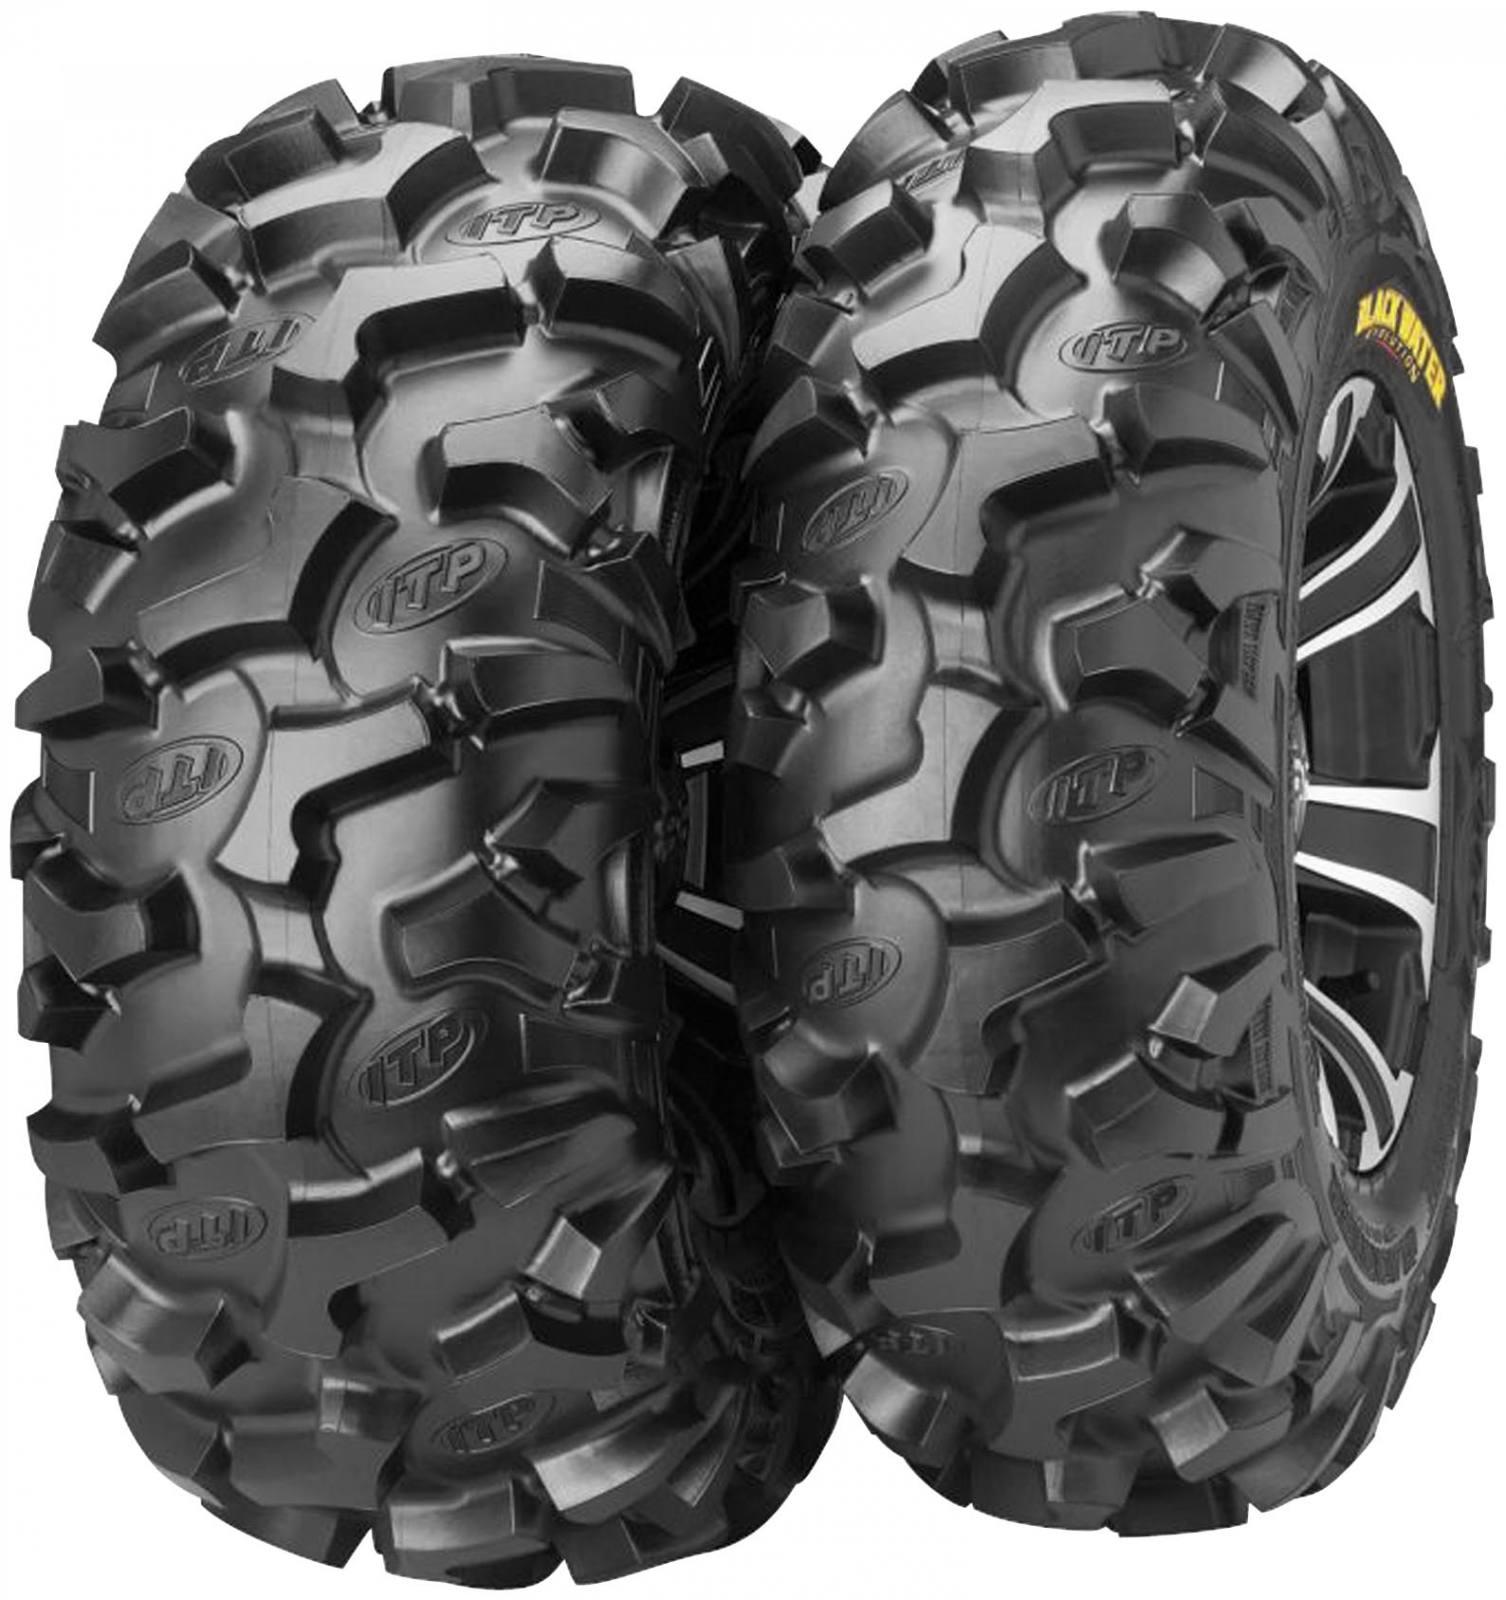 Blackwater Evolution Rear Tires